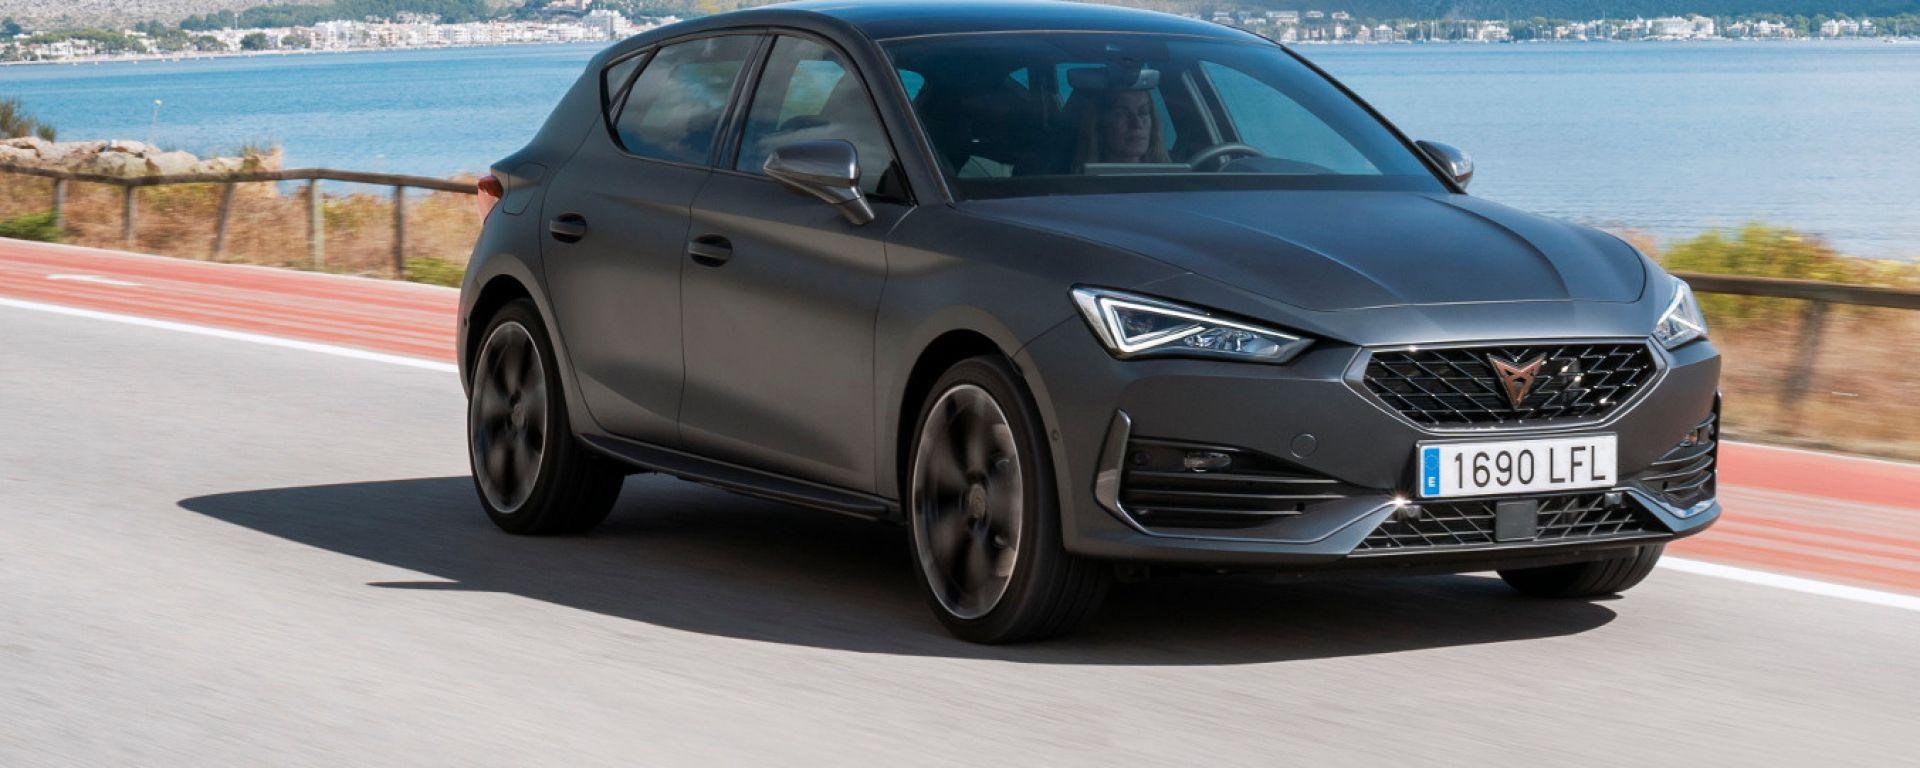 Nuova Cupra Leon: berlina o wagon, la sportiva è ibrida plug-in